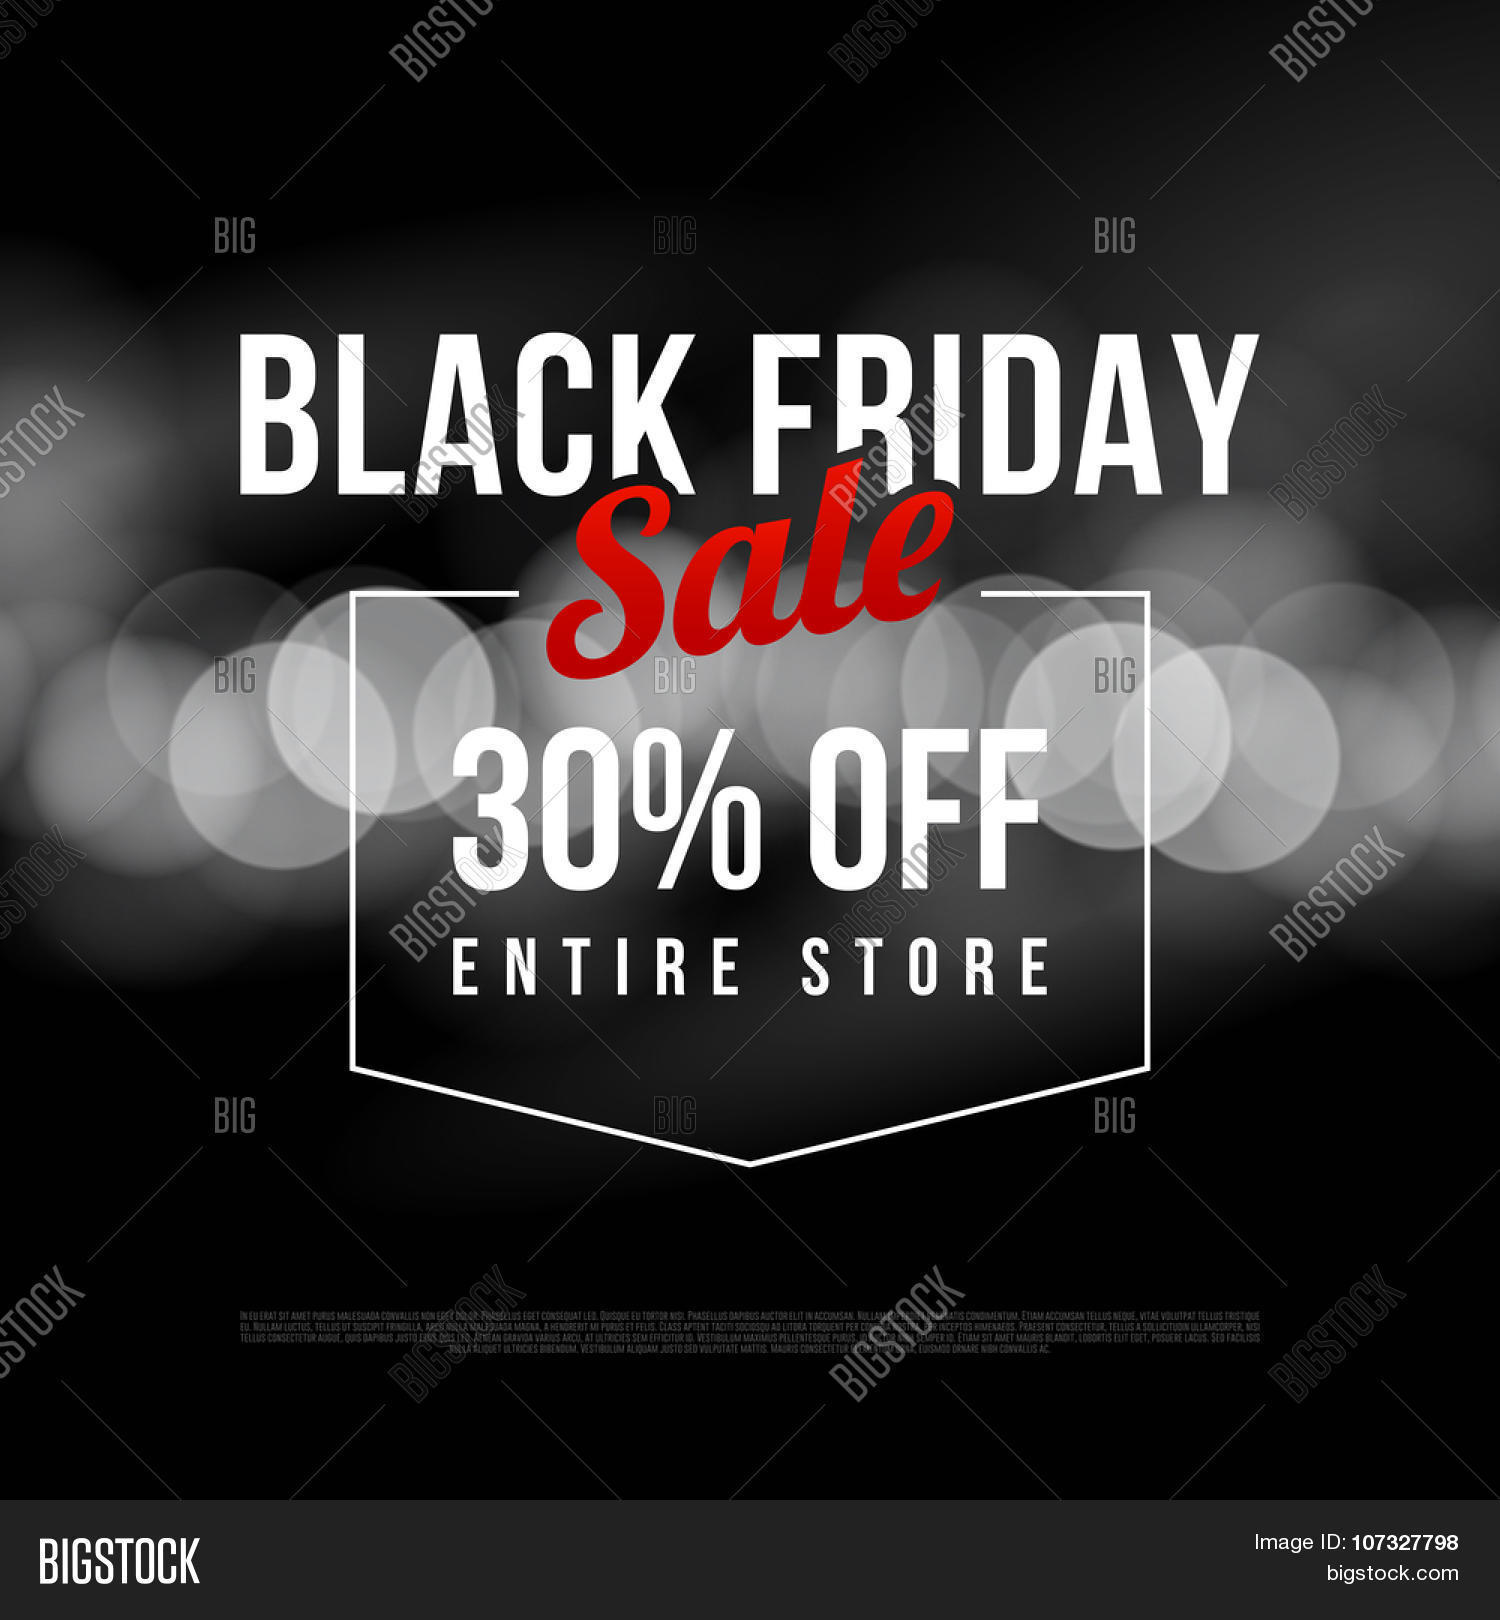 black friday sale ad template vector photo bigstock. Black Bedroom Furniture Sets. Home Design Ideas